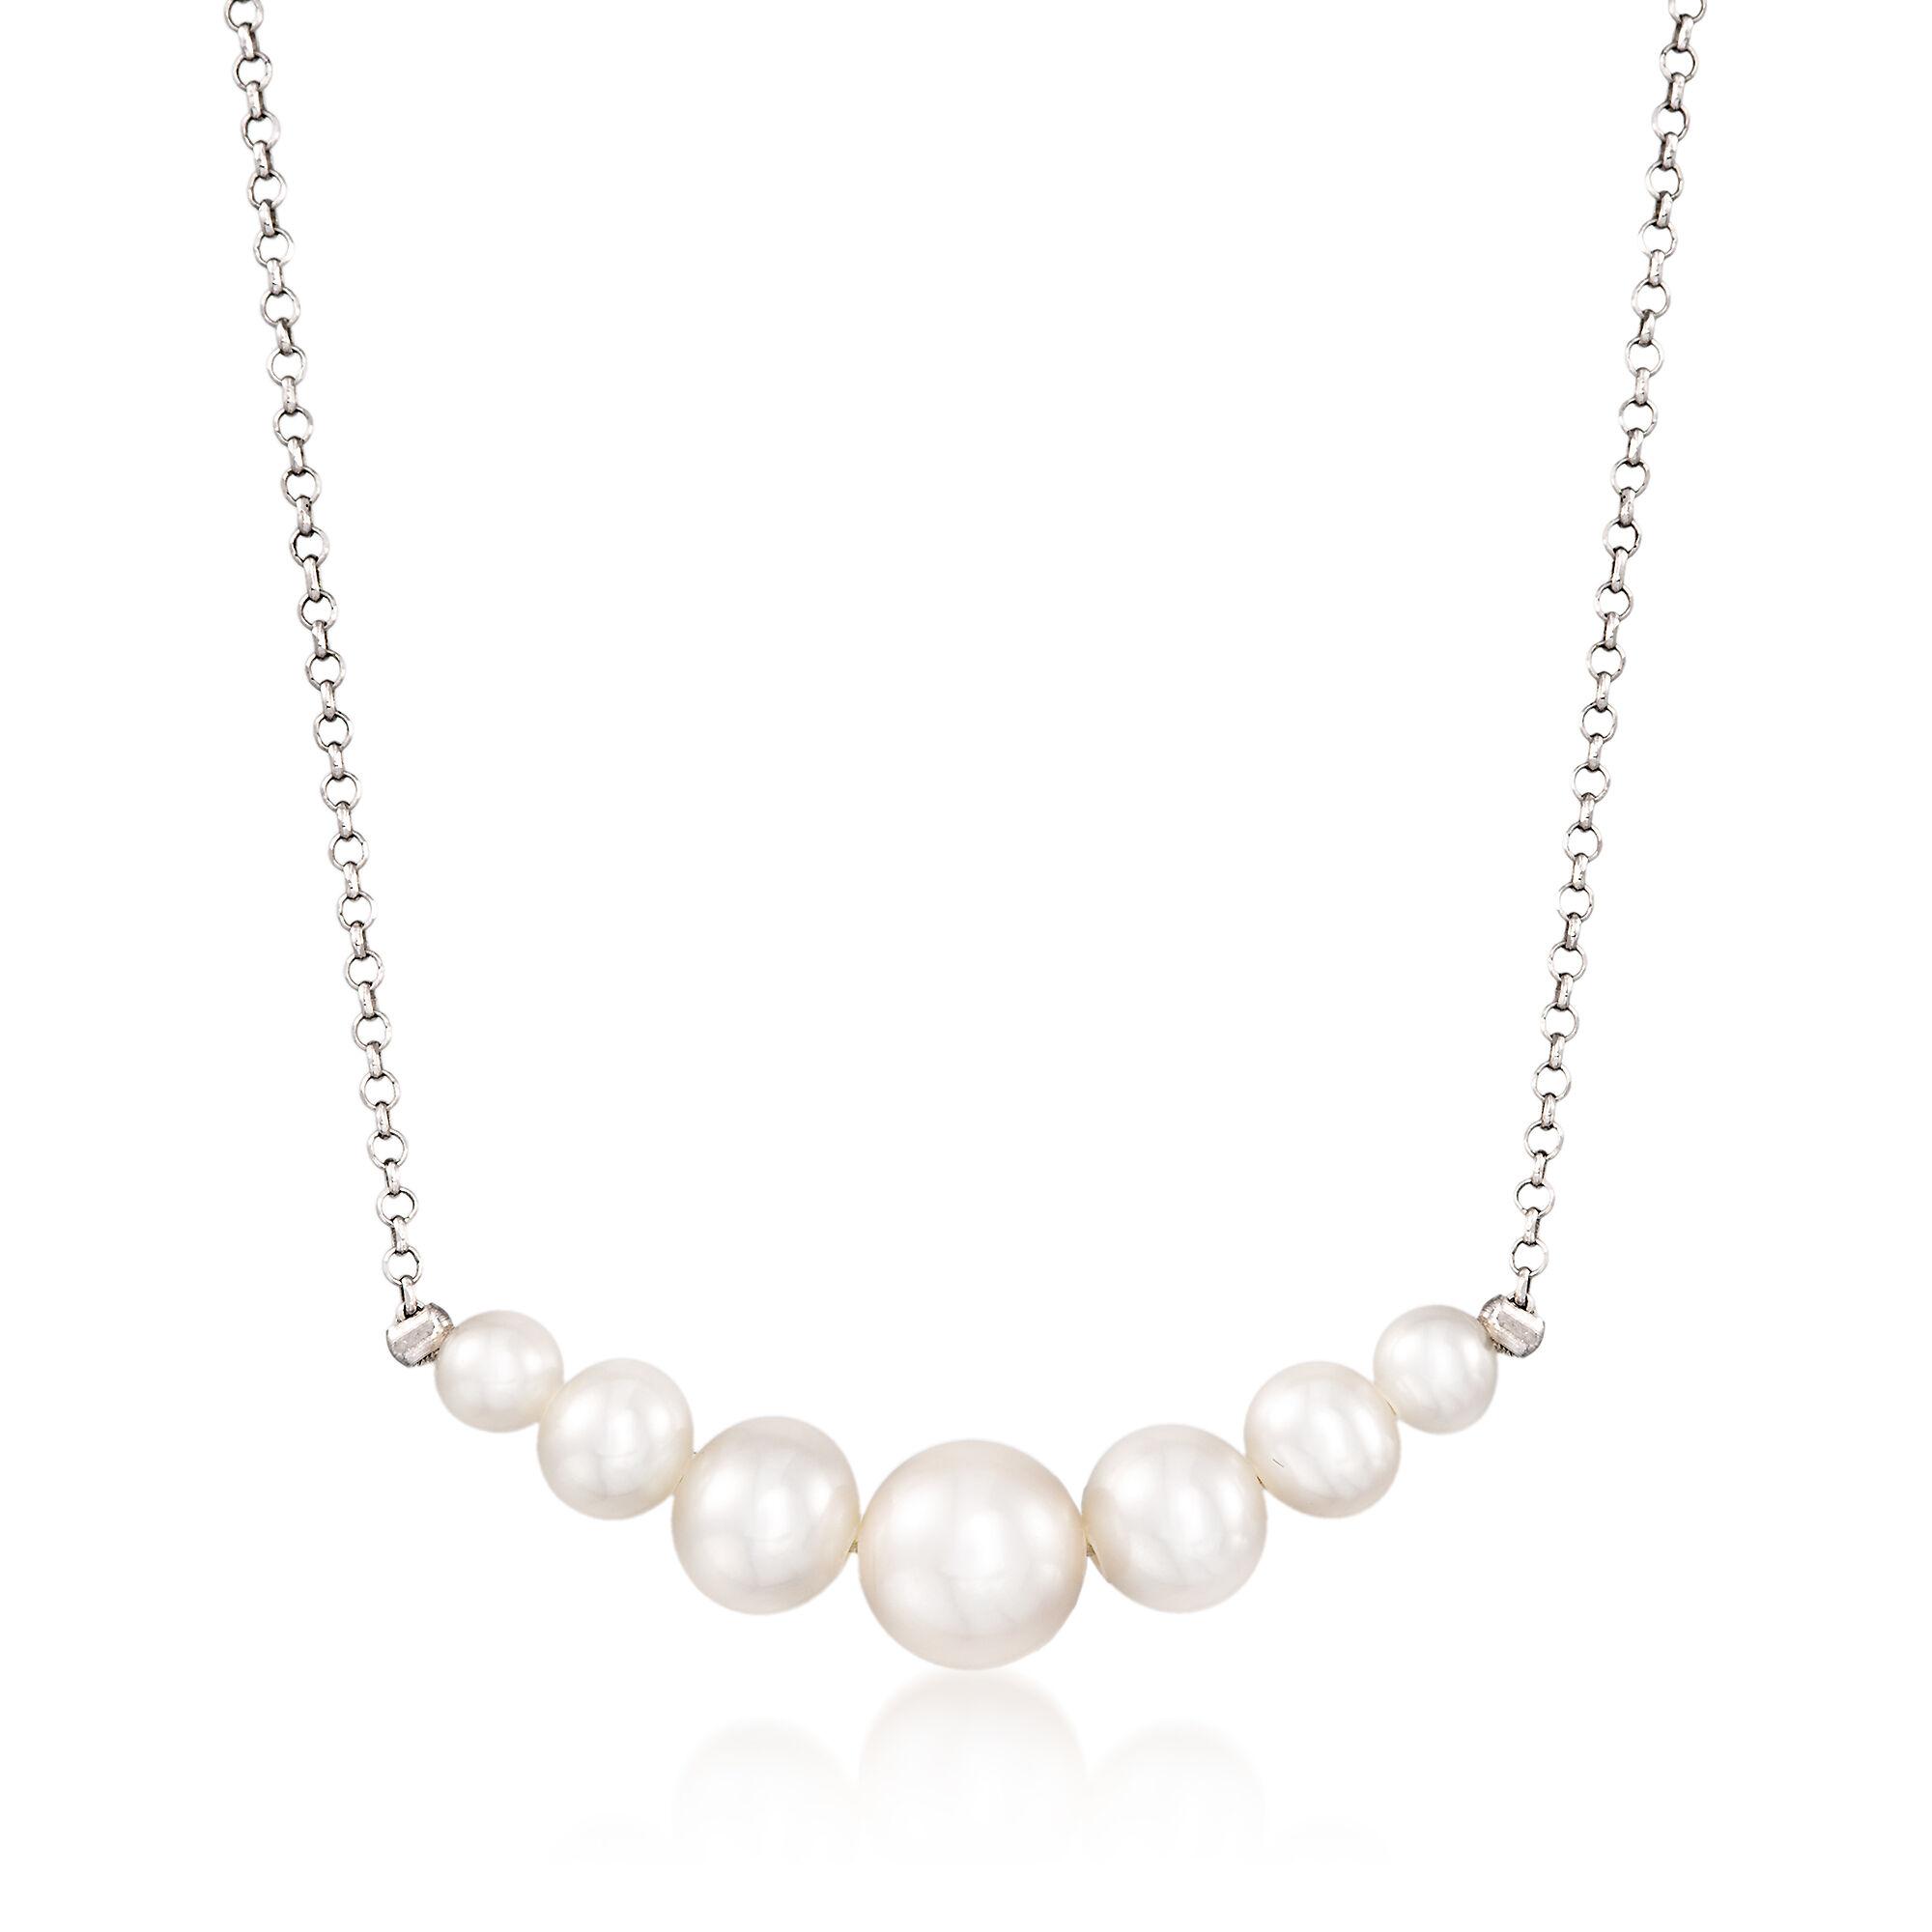 Simons Long pearly necklace da90vHtp5a